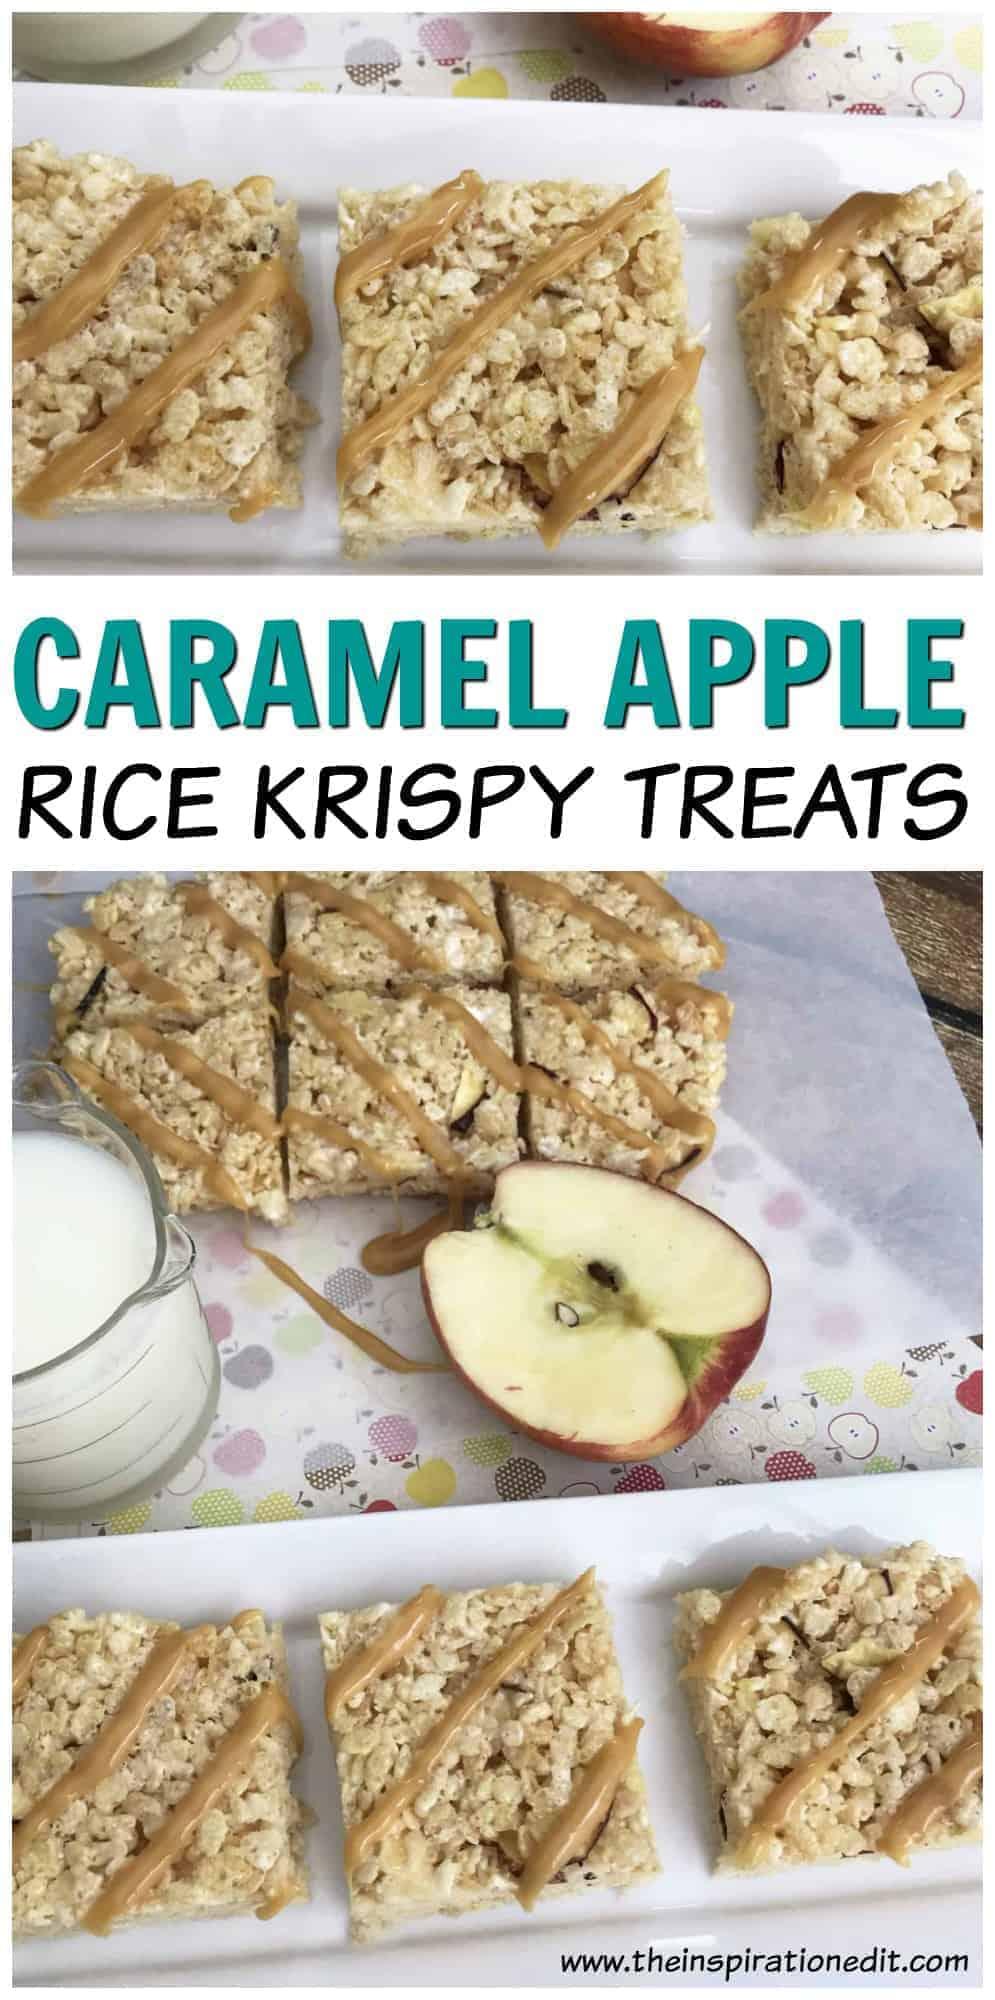 Caramel Apple Rice Krispies Treats